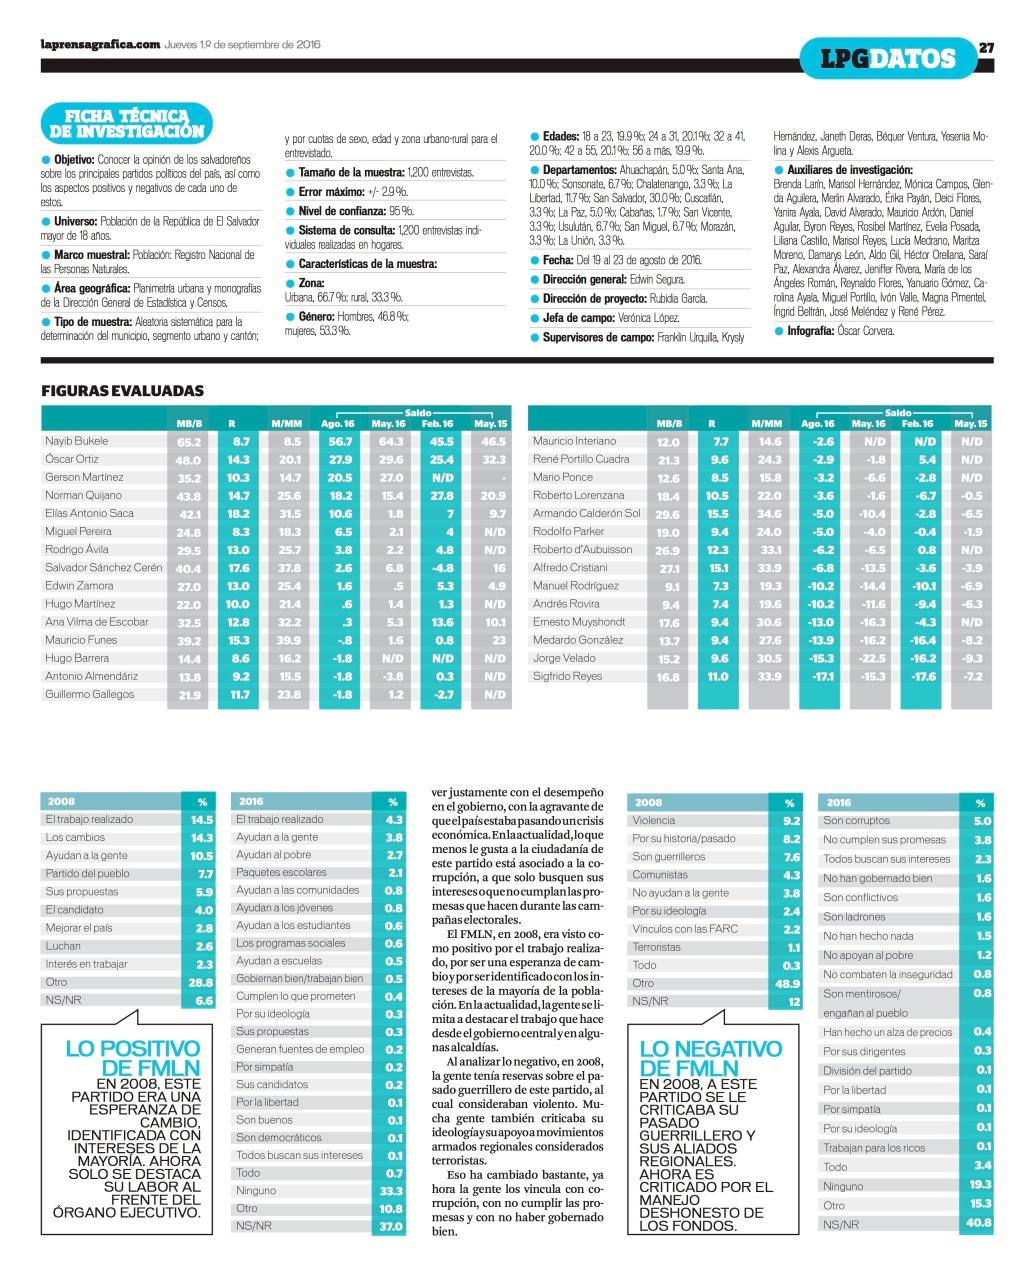 LPG20160901 - La Prensa Gráfica - PORTADA - pag 27